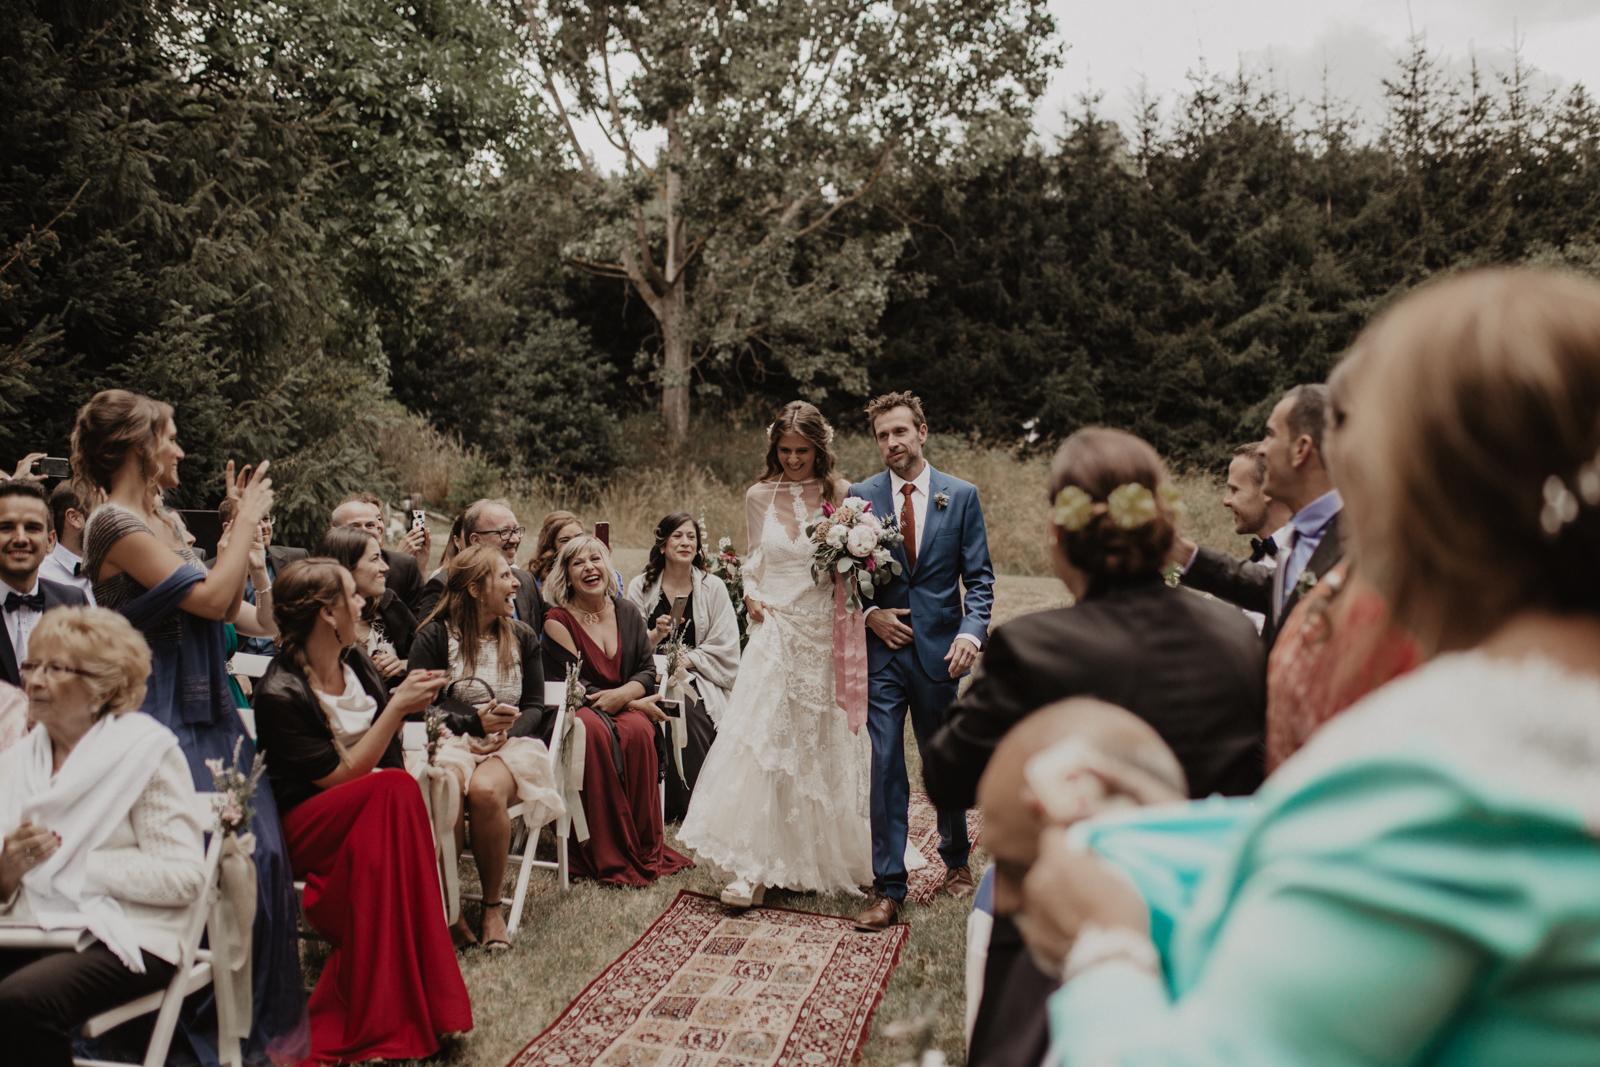 thenortherngirlphotography_photography_thenortherngirl_rebeccascabros_wedding_weddingphotography_weddingphotographer_barcelona_bodaenbarcelona_bodaenmaselmarti_bodarogeryvane-359.jpg